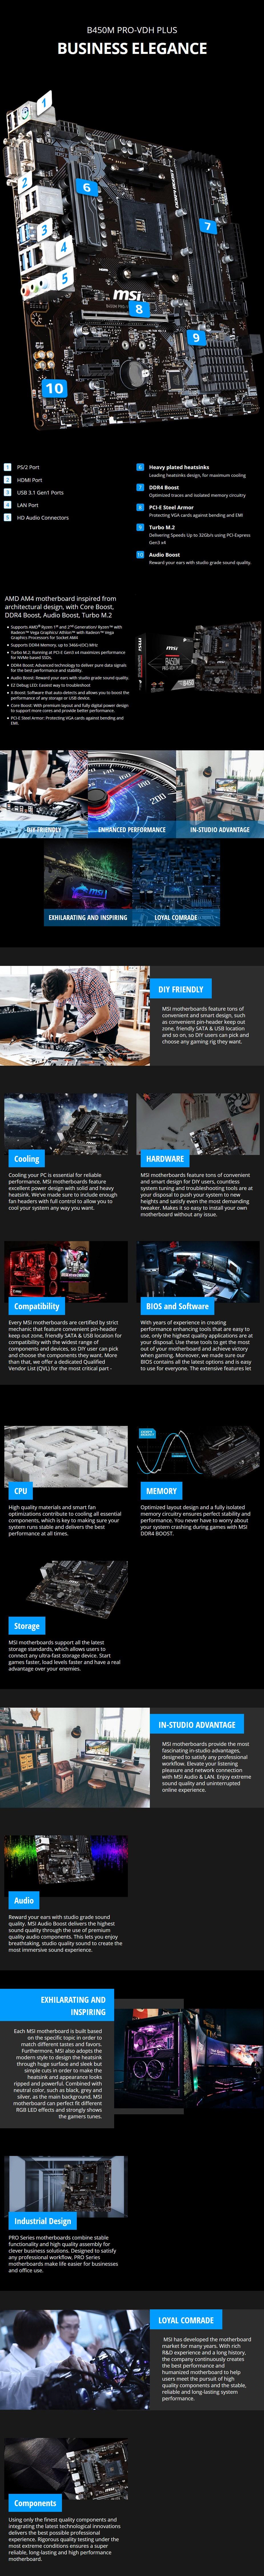 MSI B450M PRO-VDH PLUS AM4 M-ATX Motherboard - Desktop Overview 1